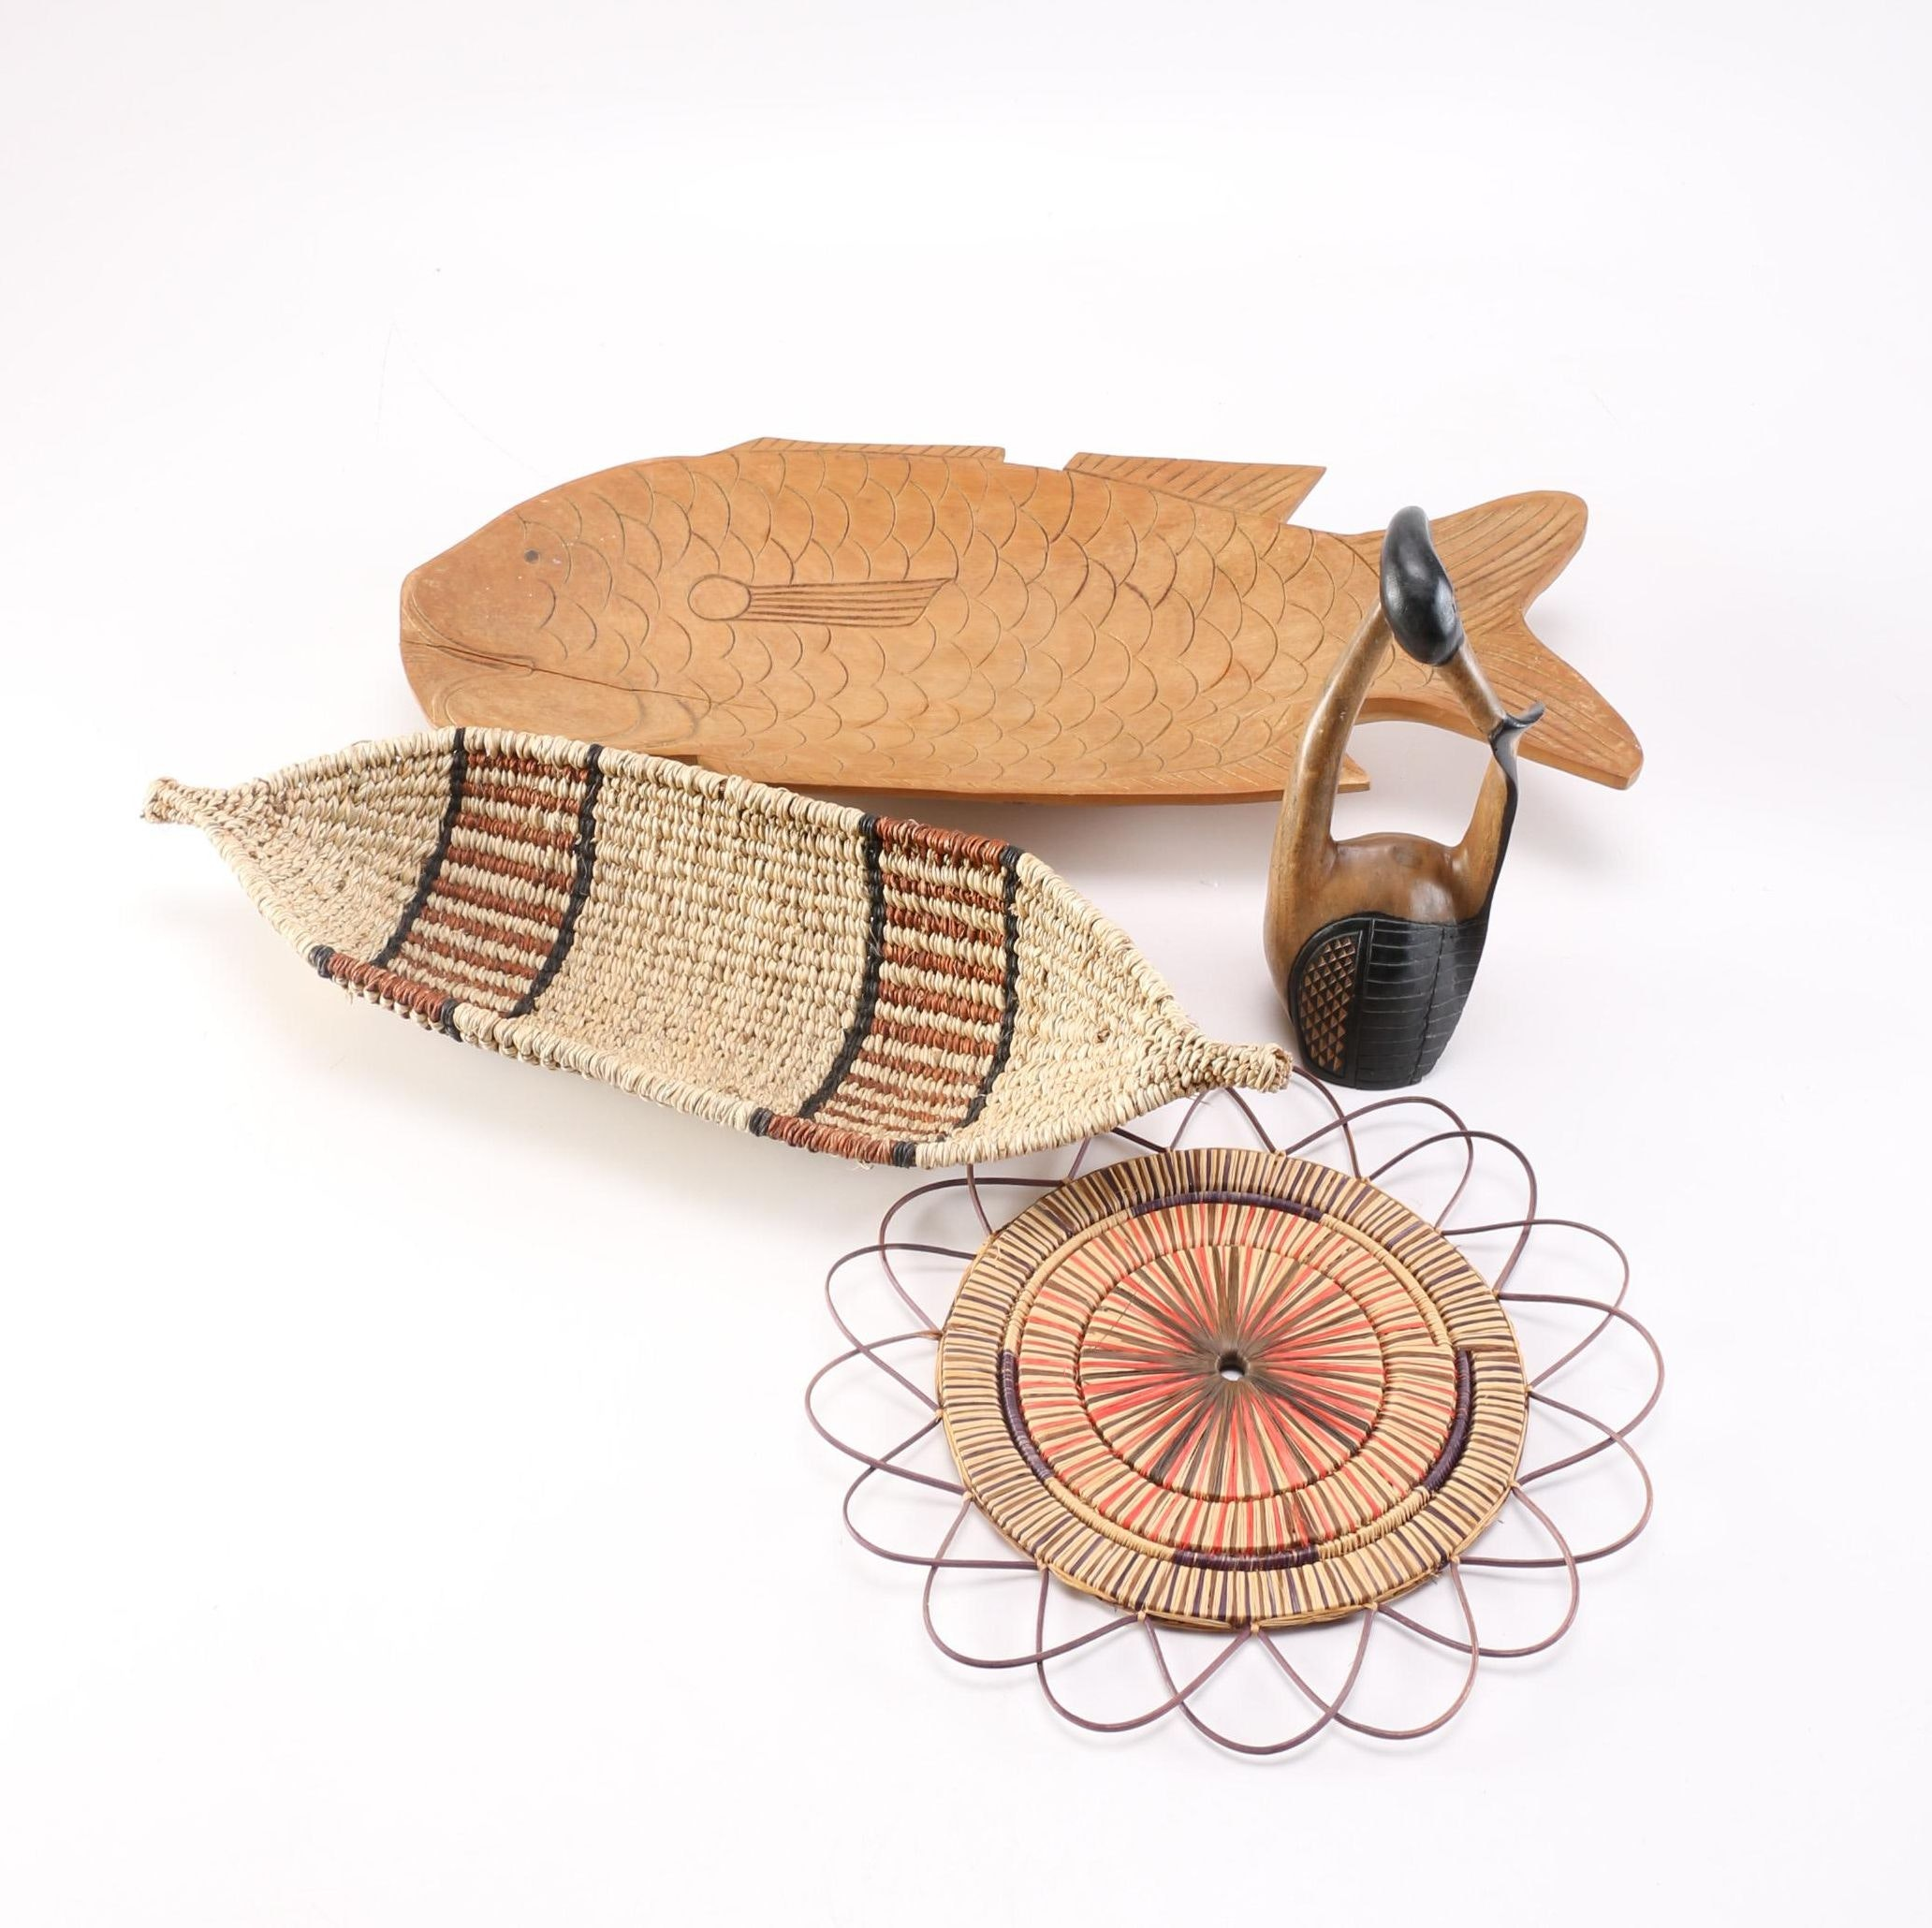 Handmade Wooden and Basket Decor